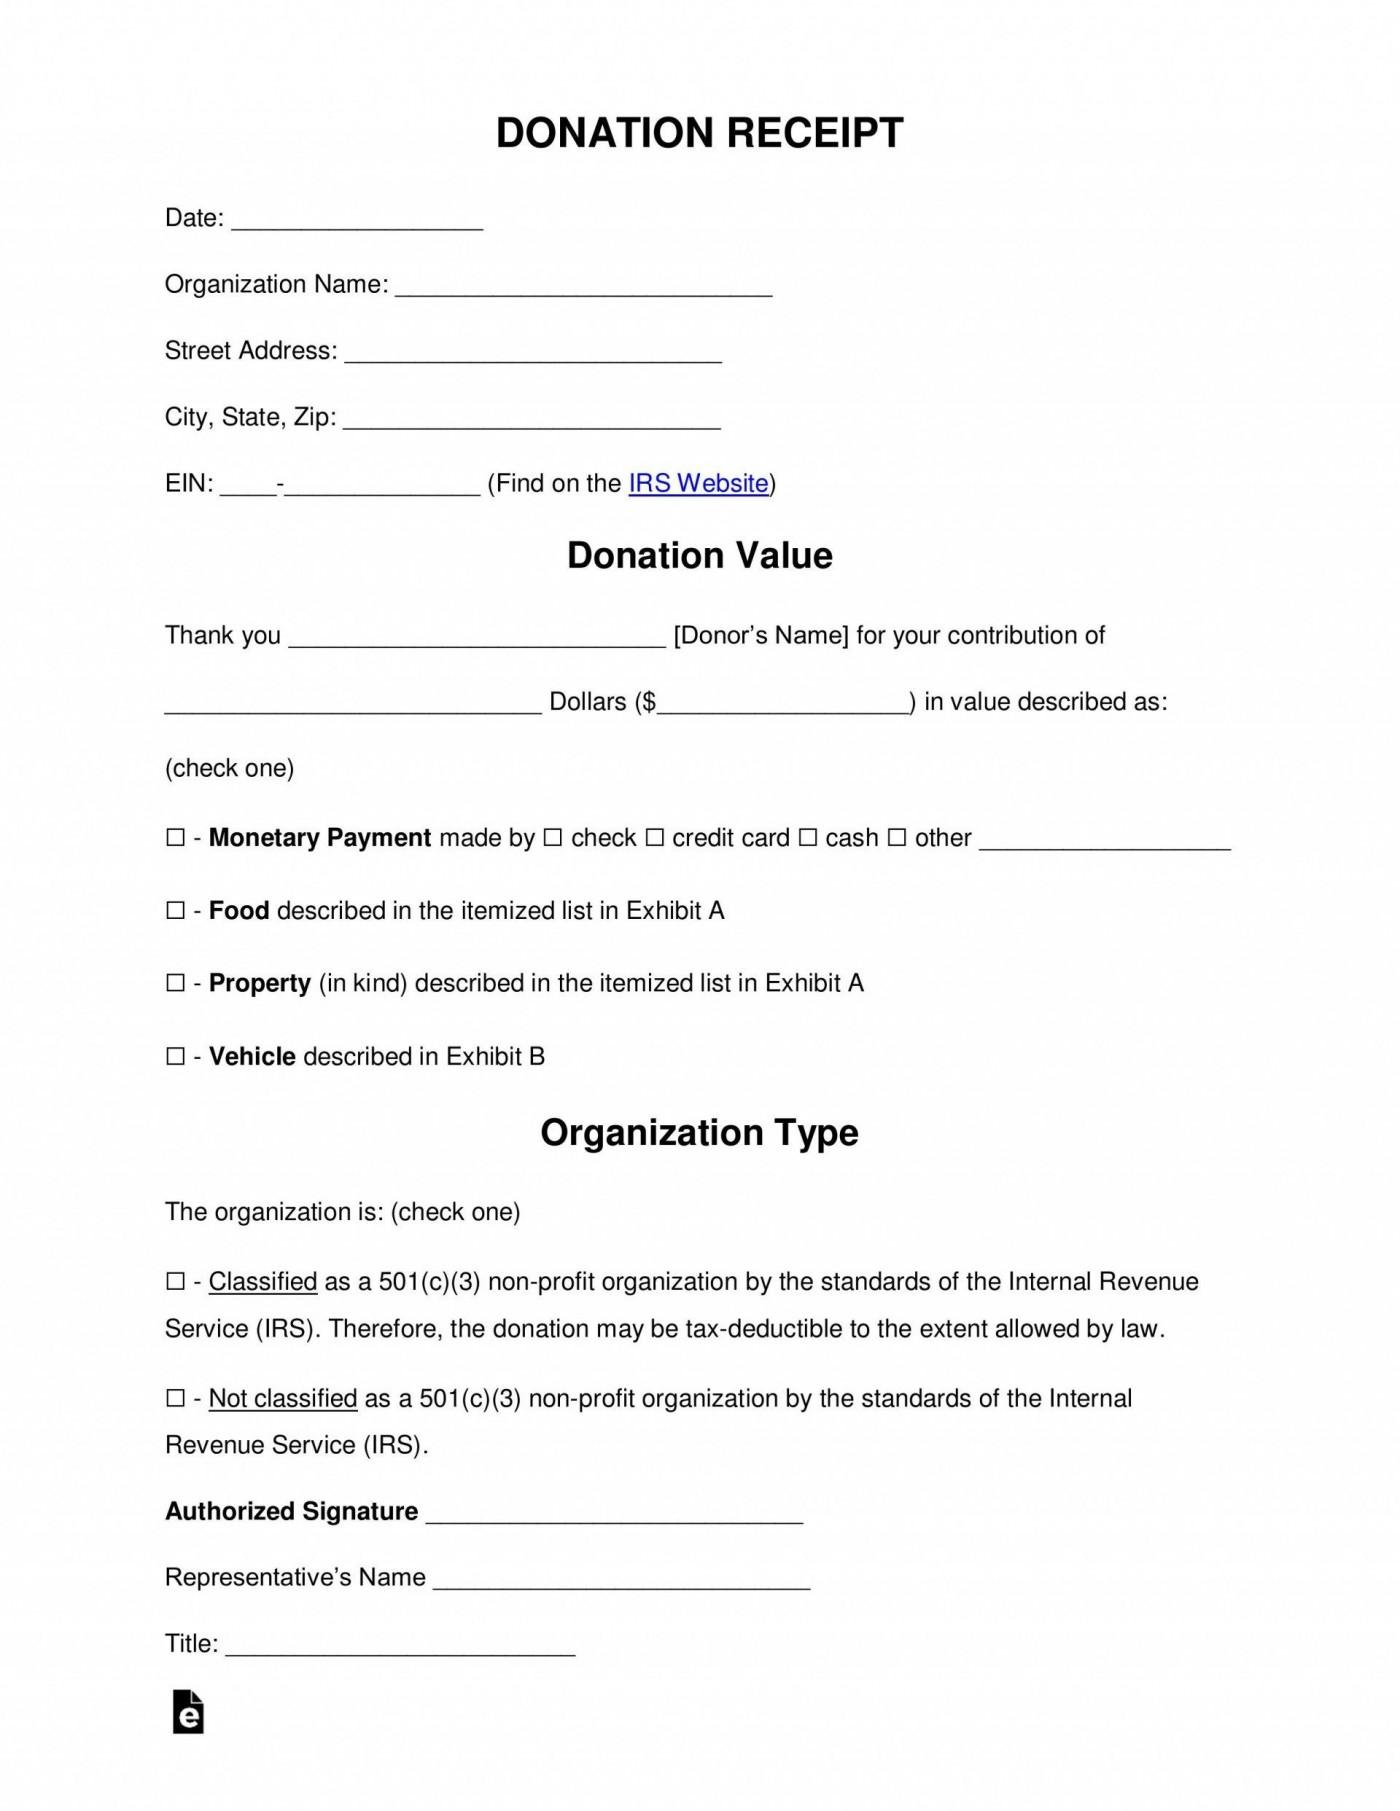 006 Exceptional Tax Deductible Donation Receipt Template Australia Inspiration 1400